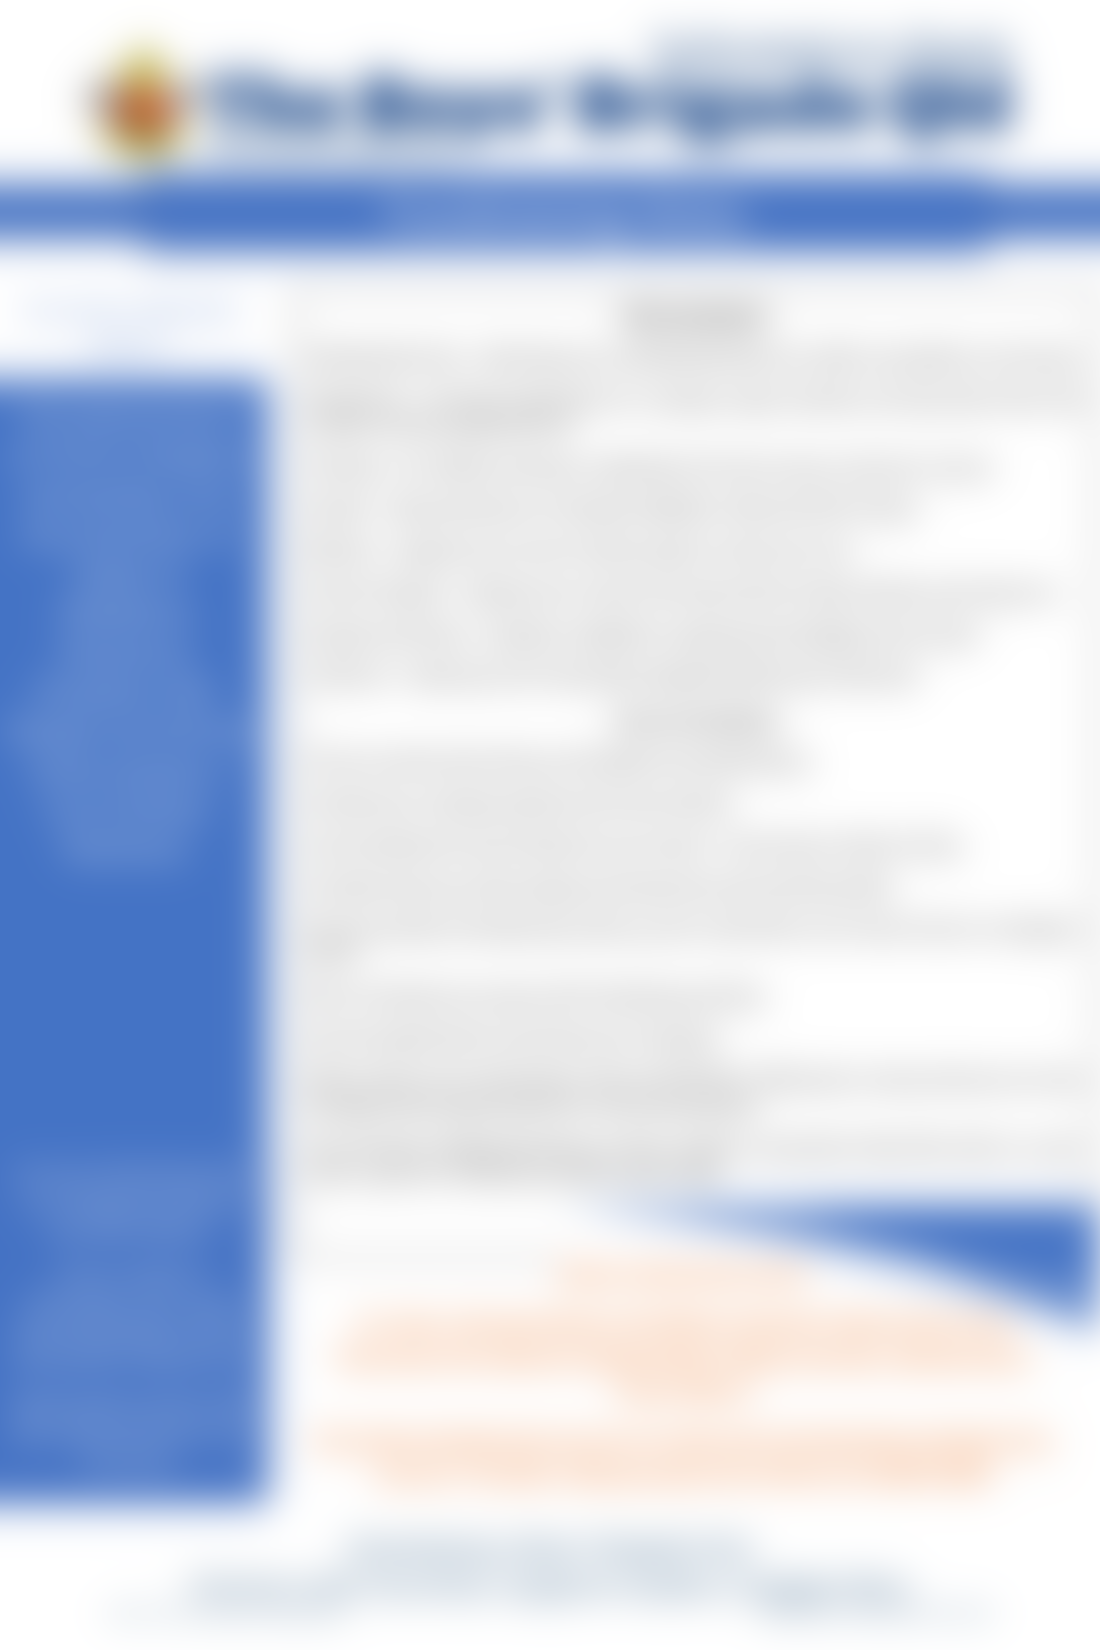 Info Sheet - Fundraising Hints 2020